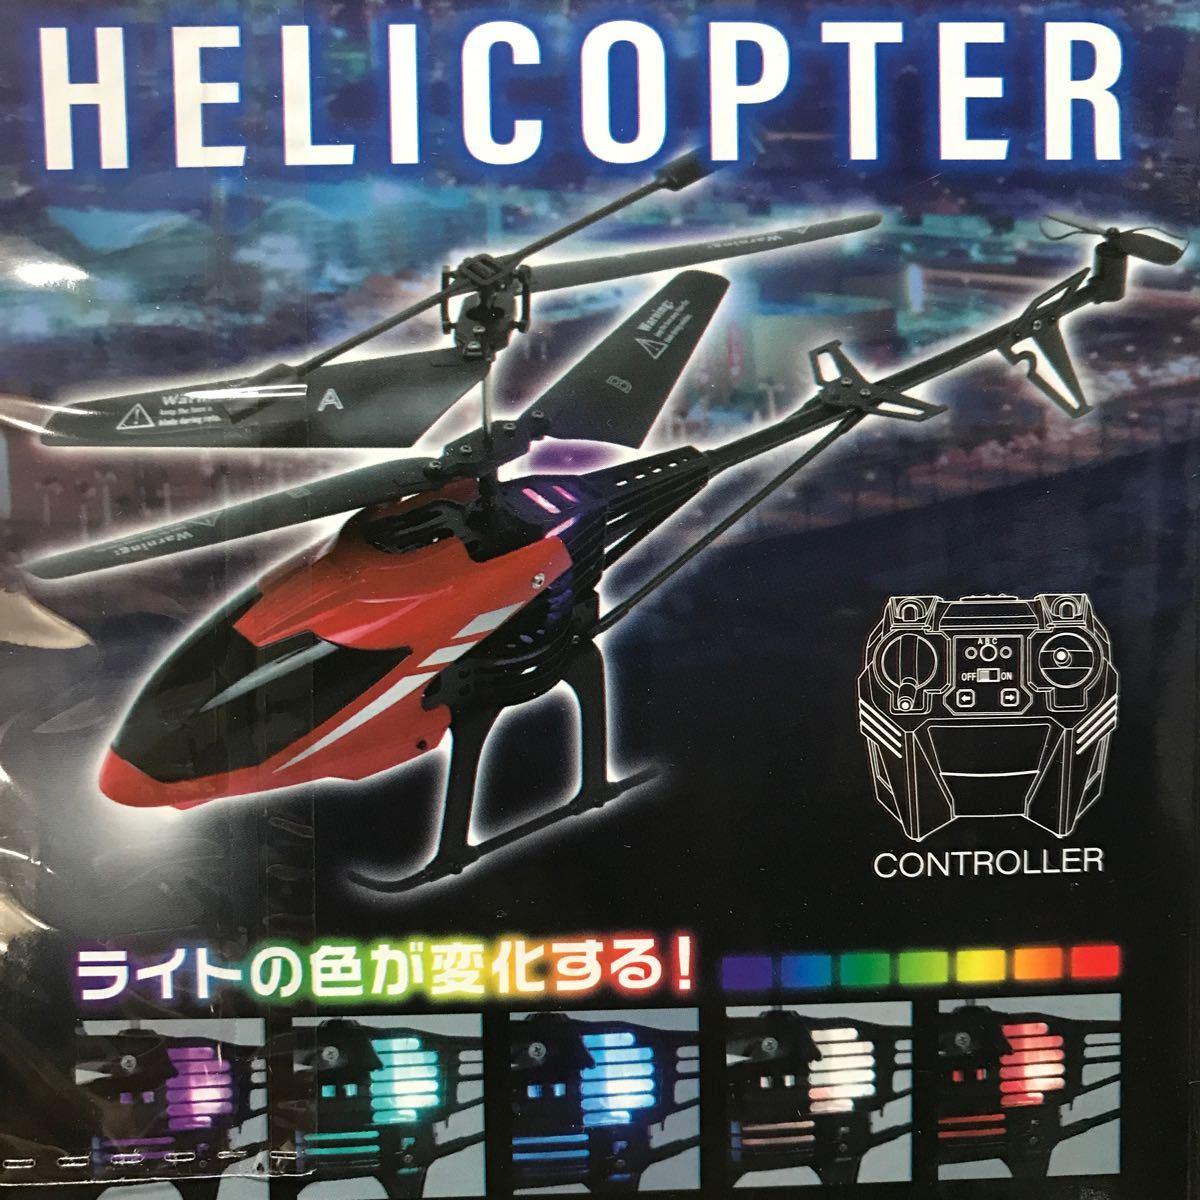 RCヘリコプター ブラック